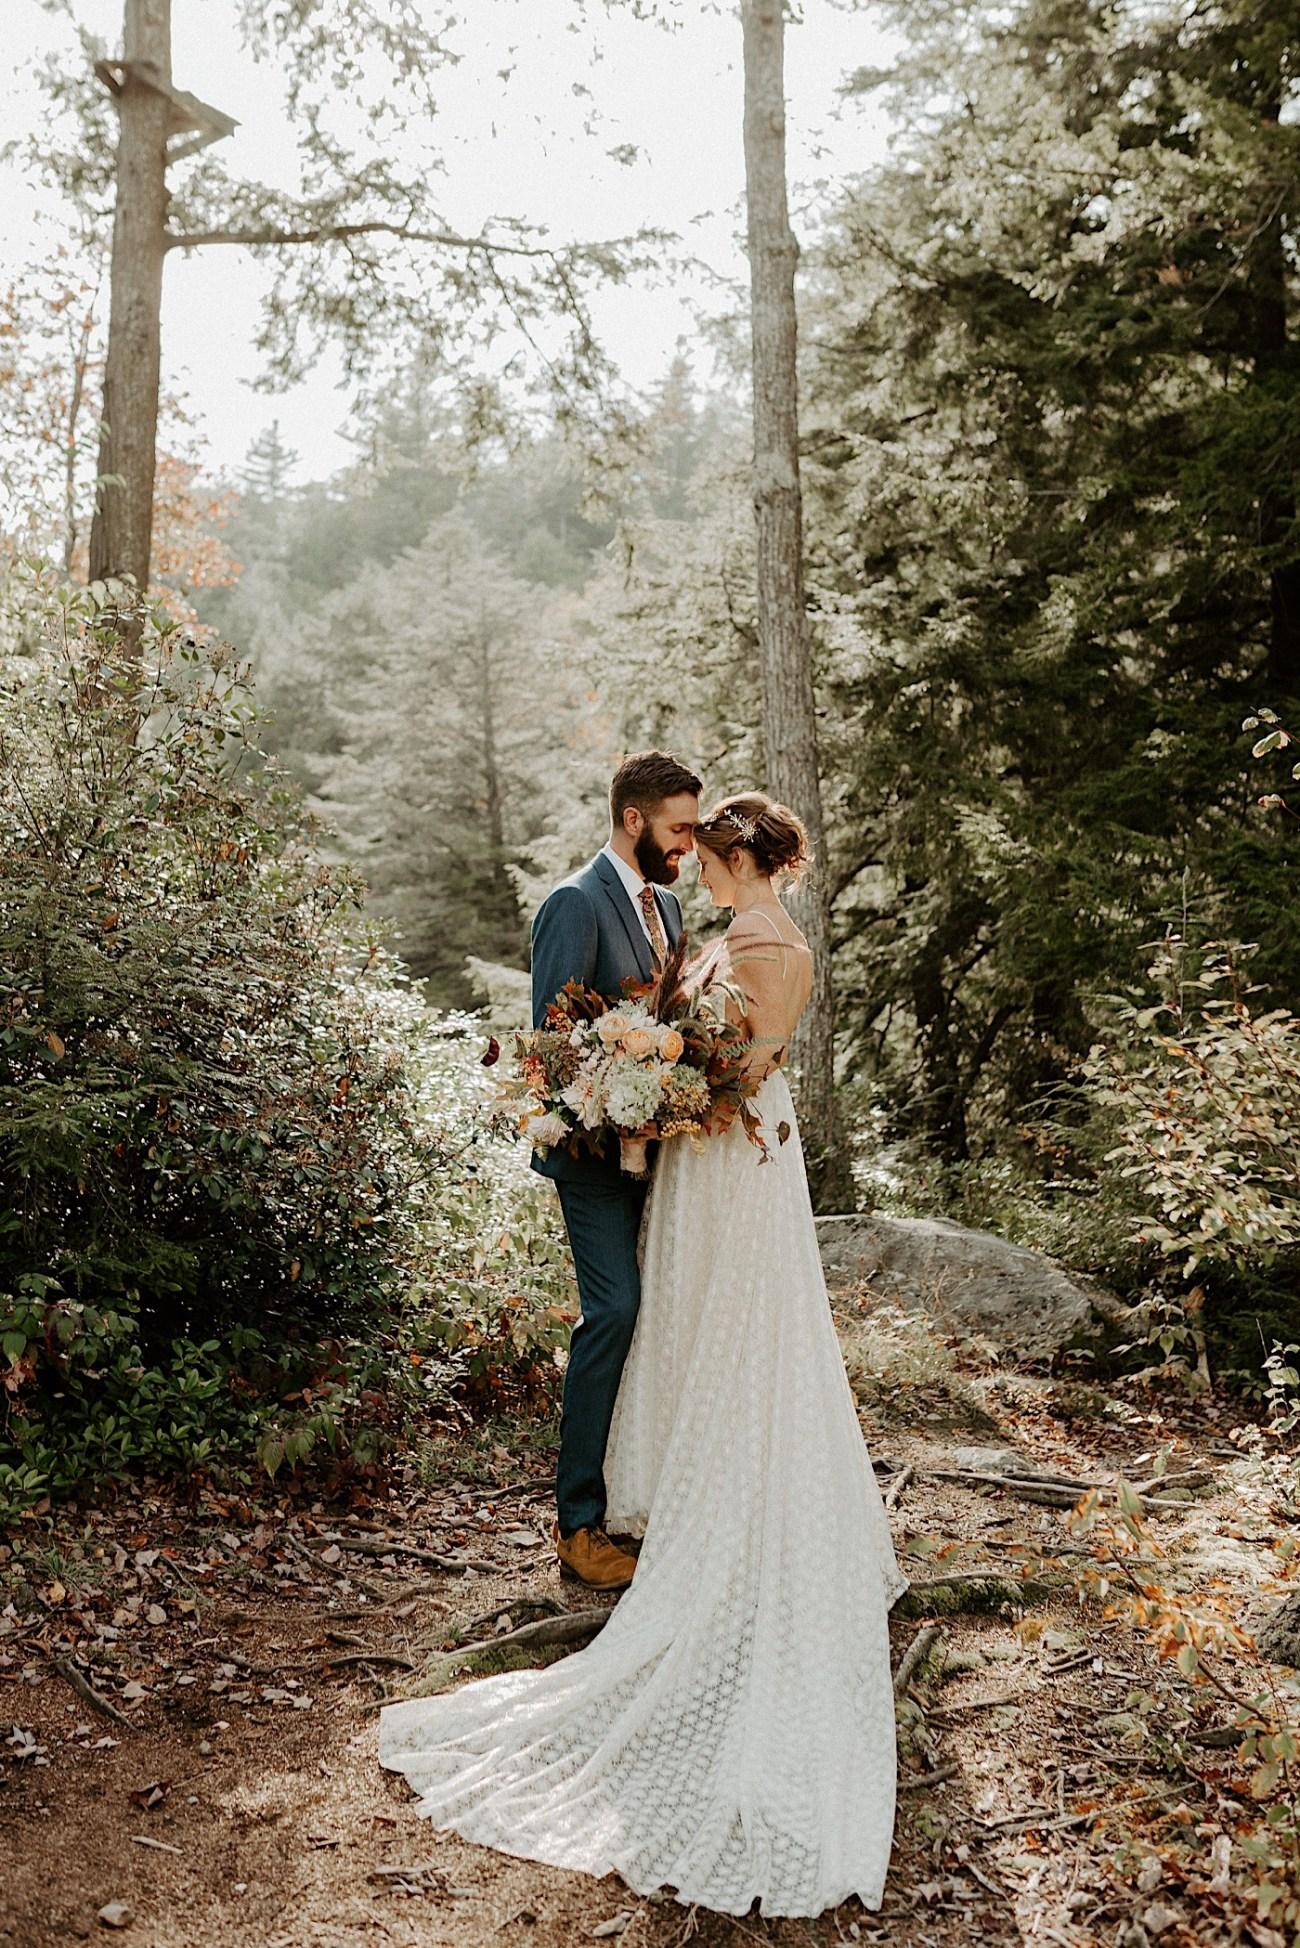 Destination Lakeside Wedding Mt Washington Wedding Outdoor Wedding Boston Wedding Photographer 031